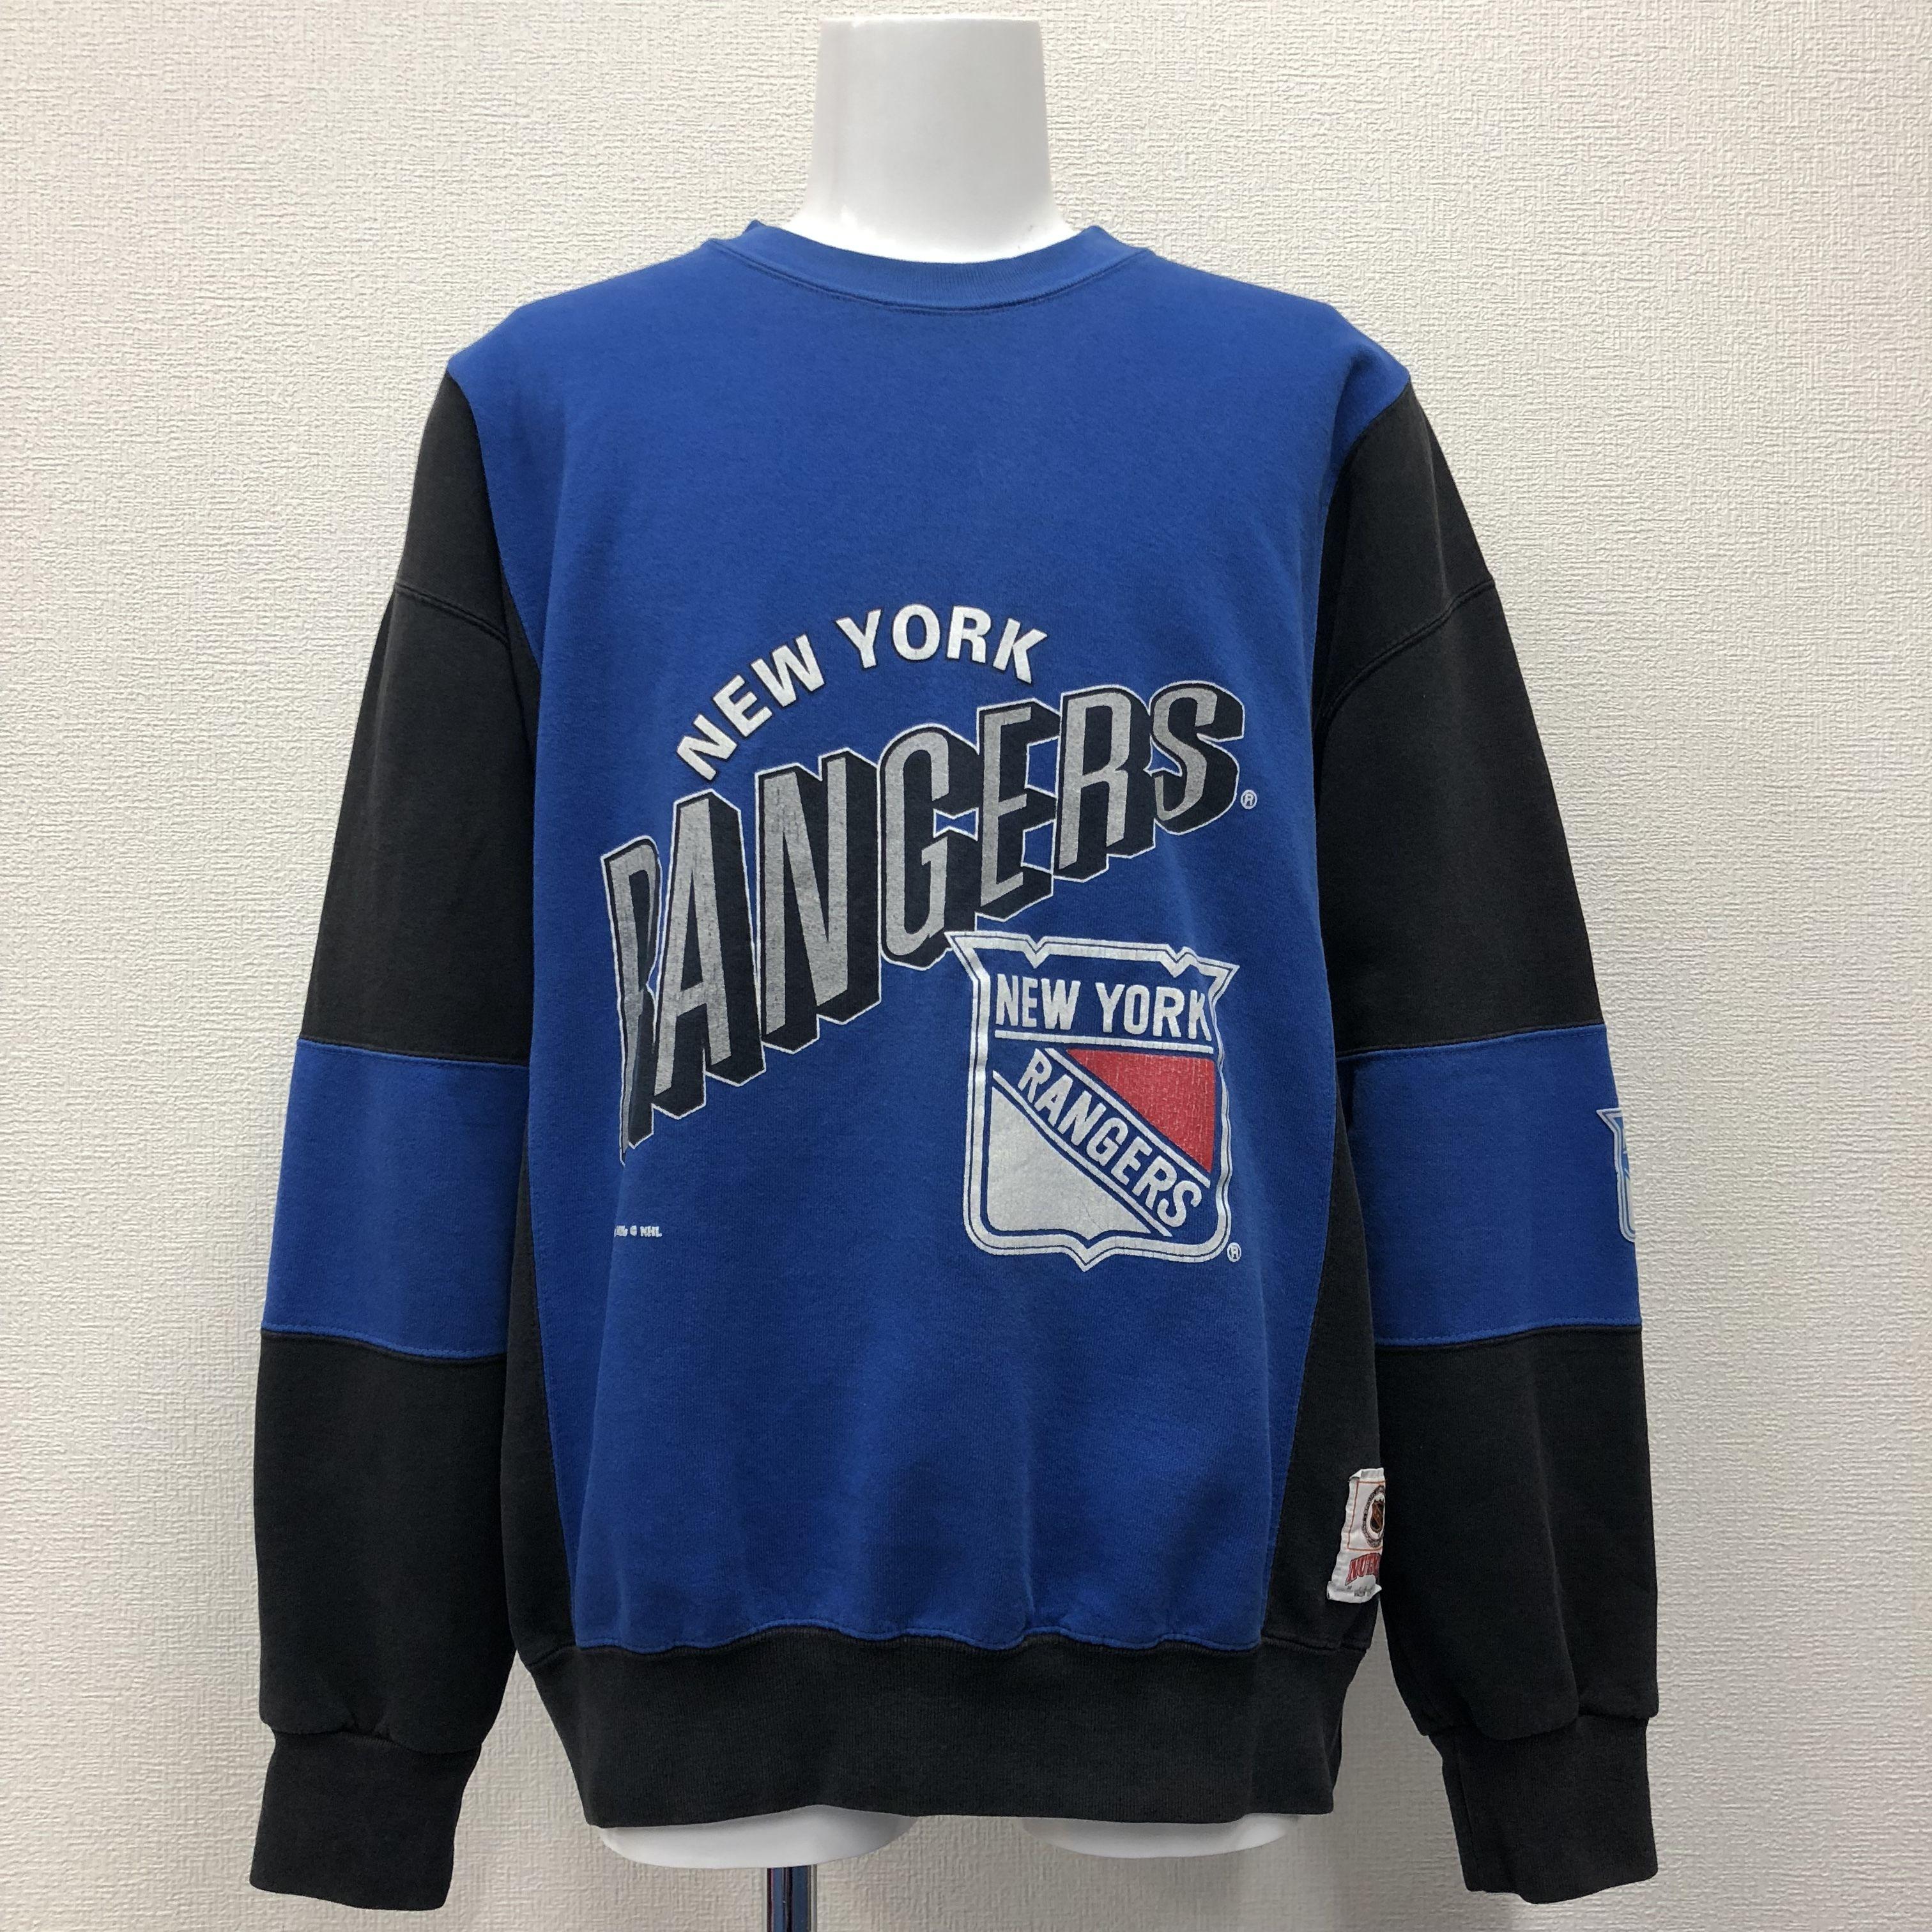 90s New York Rangers Sweatshirt